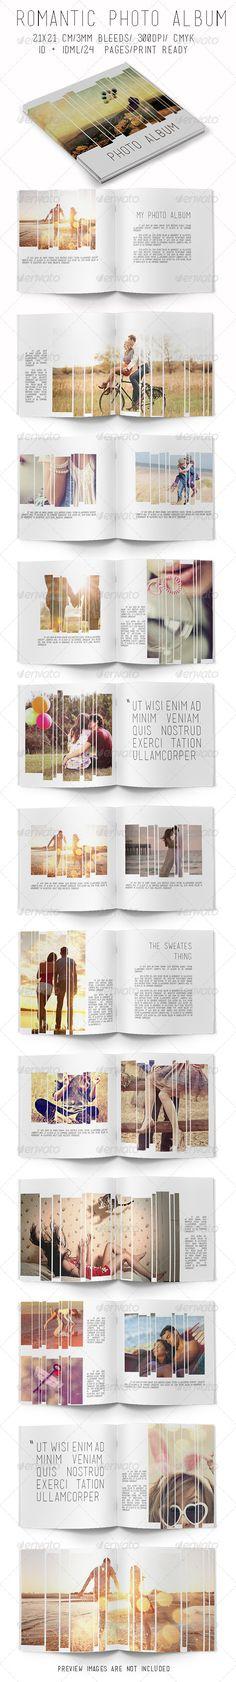 Romantic Photo Album Template | Download: http://graphicriver.net/item/romantic-photo-album/7819816?ref=ksioks